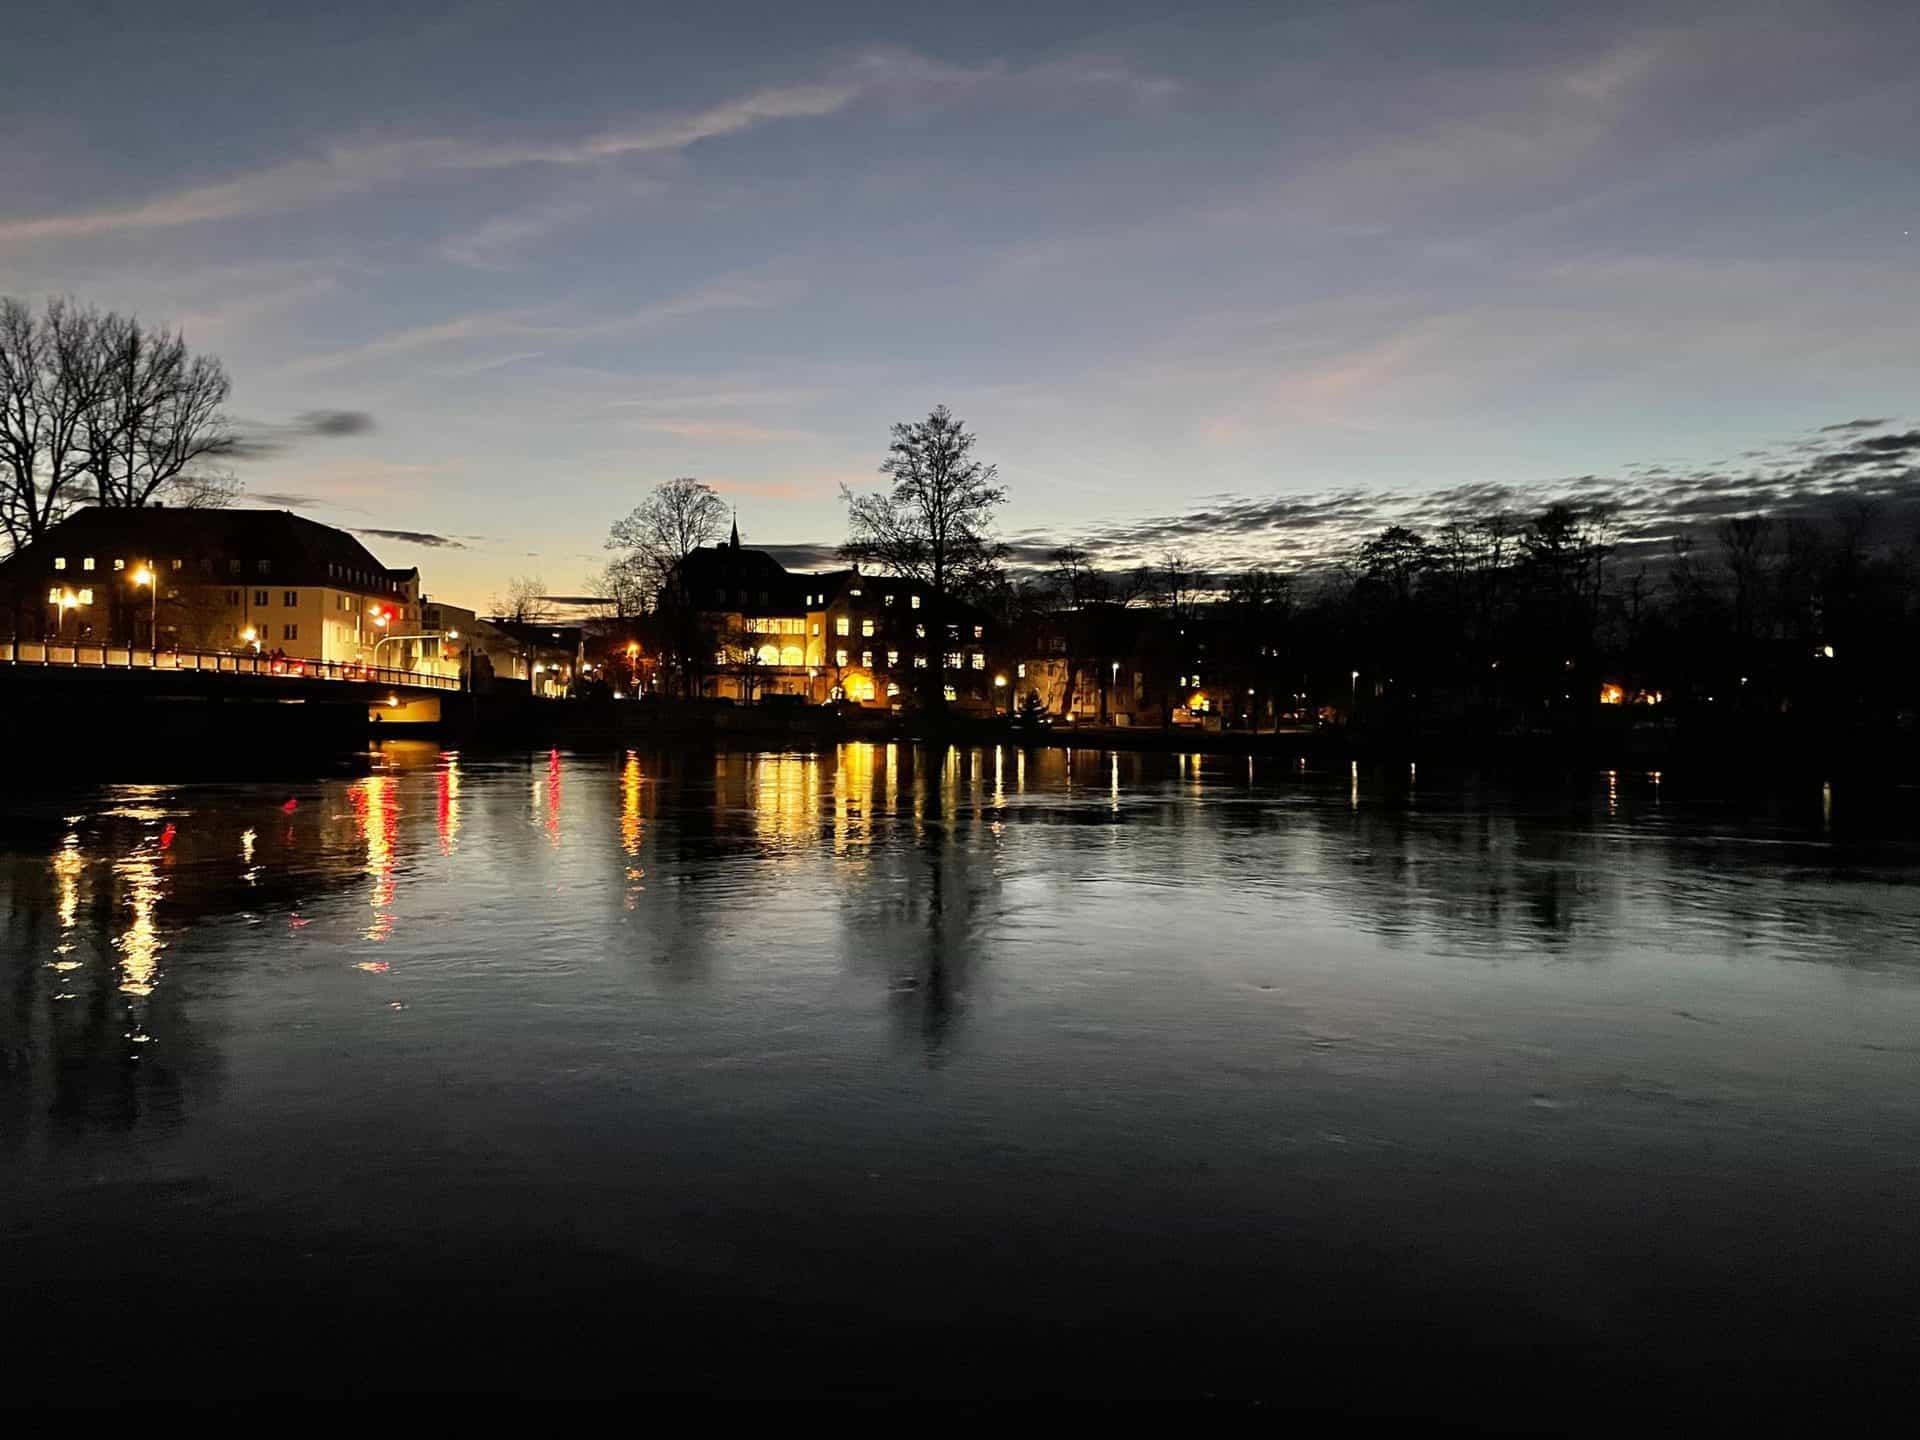 iPhone12Pro-Fotos-Landsberg-am-Lech-späte-Dämmerung-blaue-Stunde